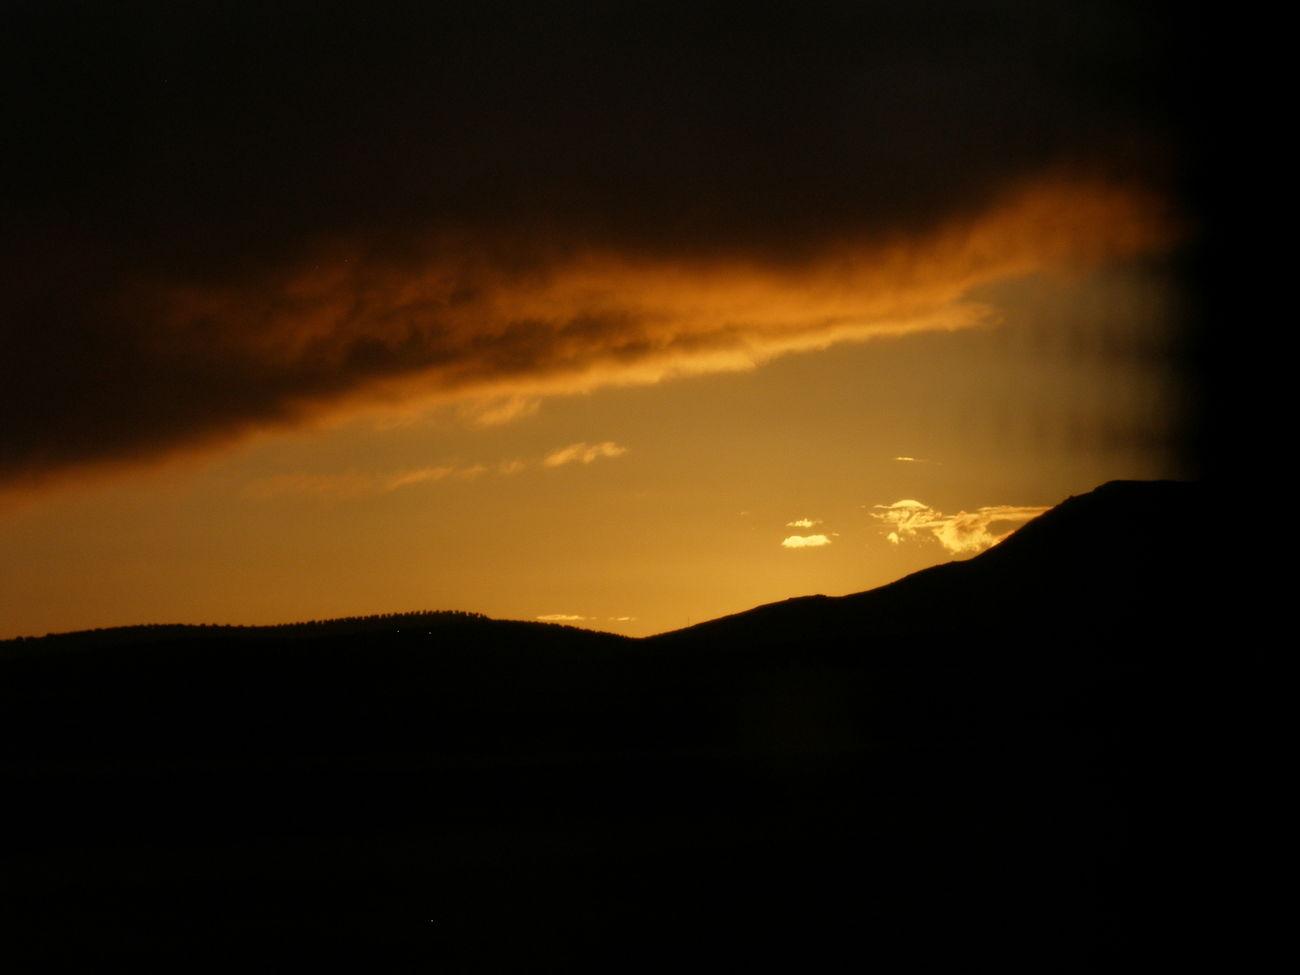 Viajar en autobus. Líneas convergentes IIISunset Sky Beauty In Nature Scenics Mountain No People Tranquility Nature Viajar Autobus Bus Atardecer Tesis99 Naranjas Orangesky Cielo Naranja Nubes Clouds Nube Cloud Lines Lineas Cloud - Sky Convergent